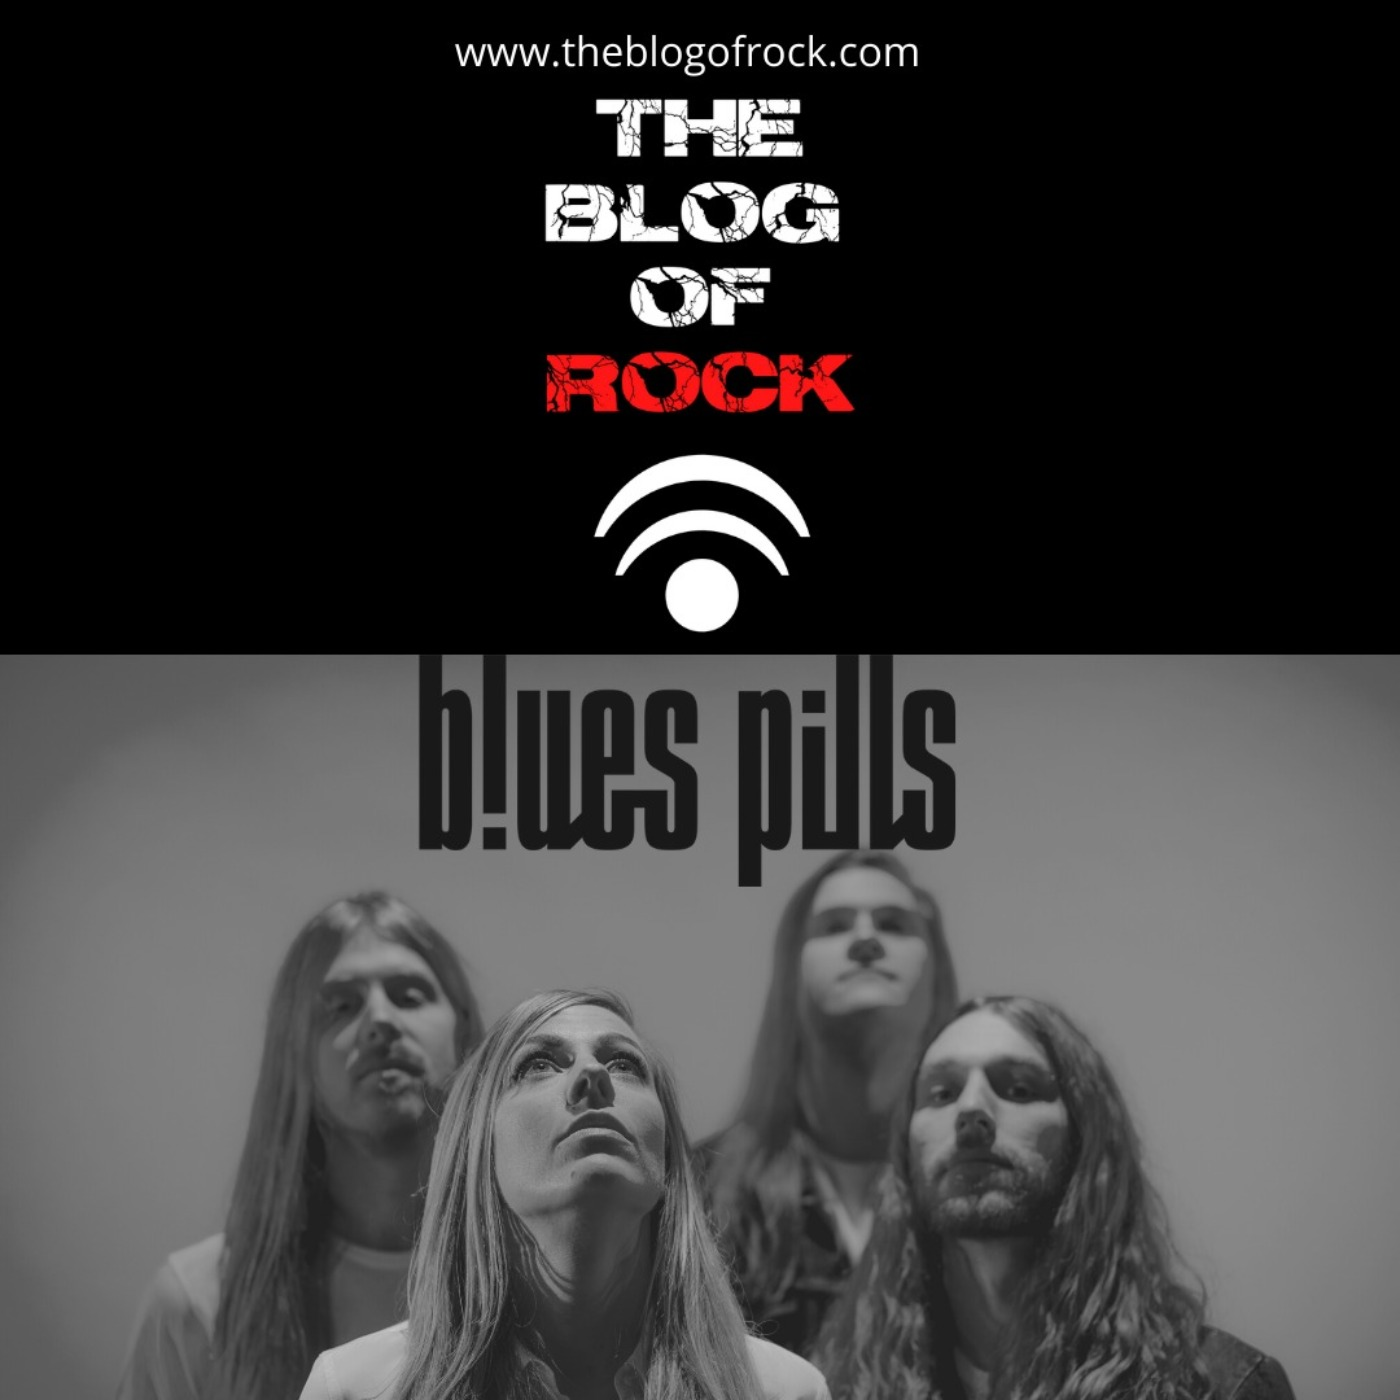 BLUES PILLS (full english version)